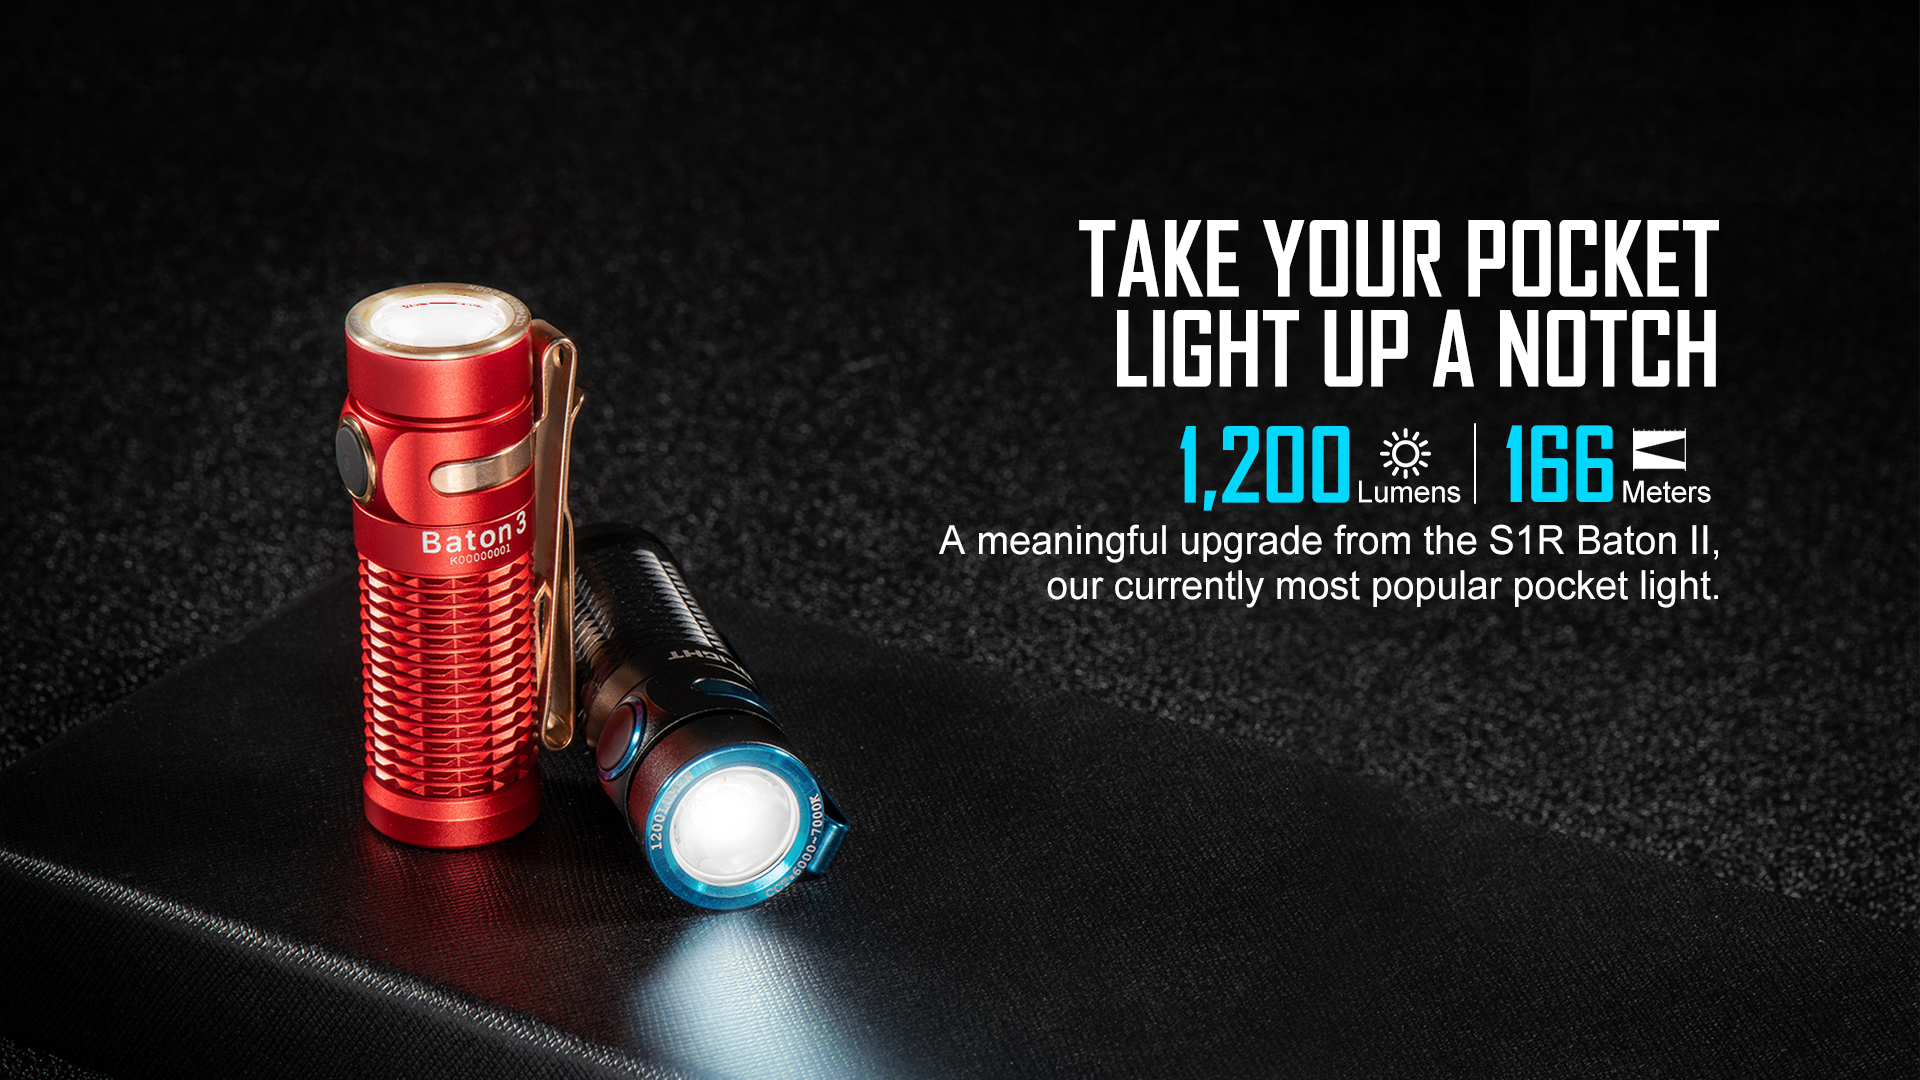 Olight Baton 3 Rechargeable LED Pocket Light